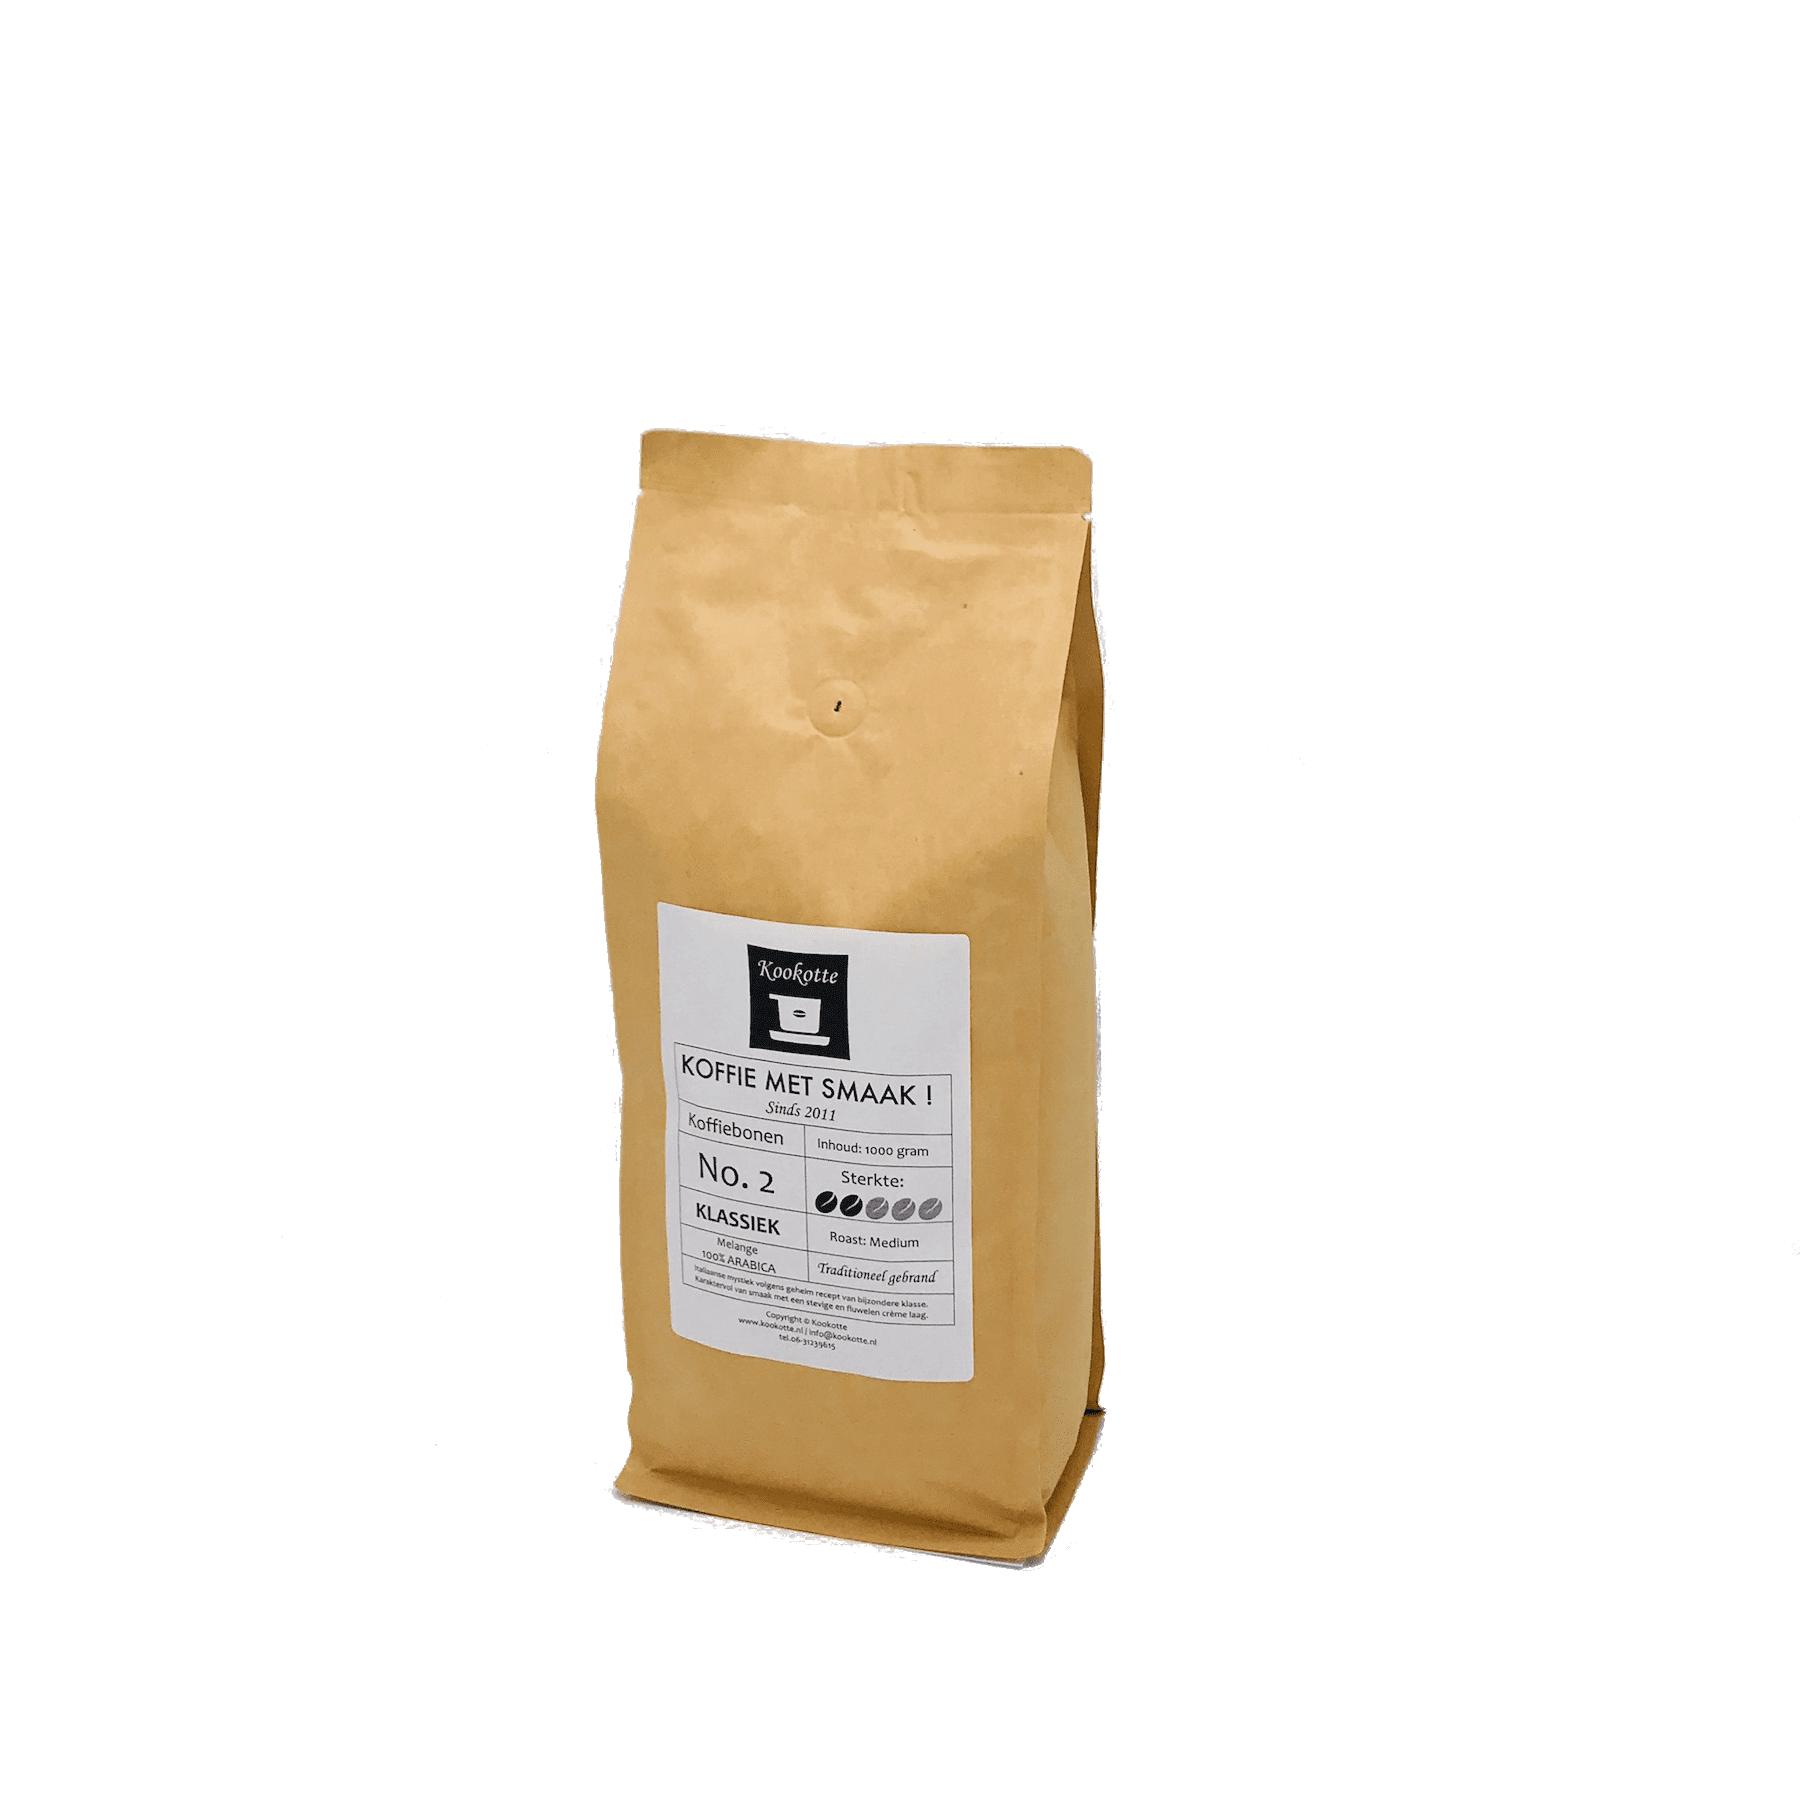 Koffiebonen No.2